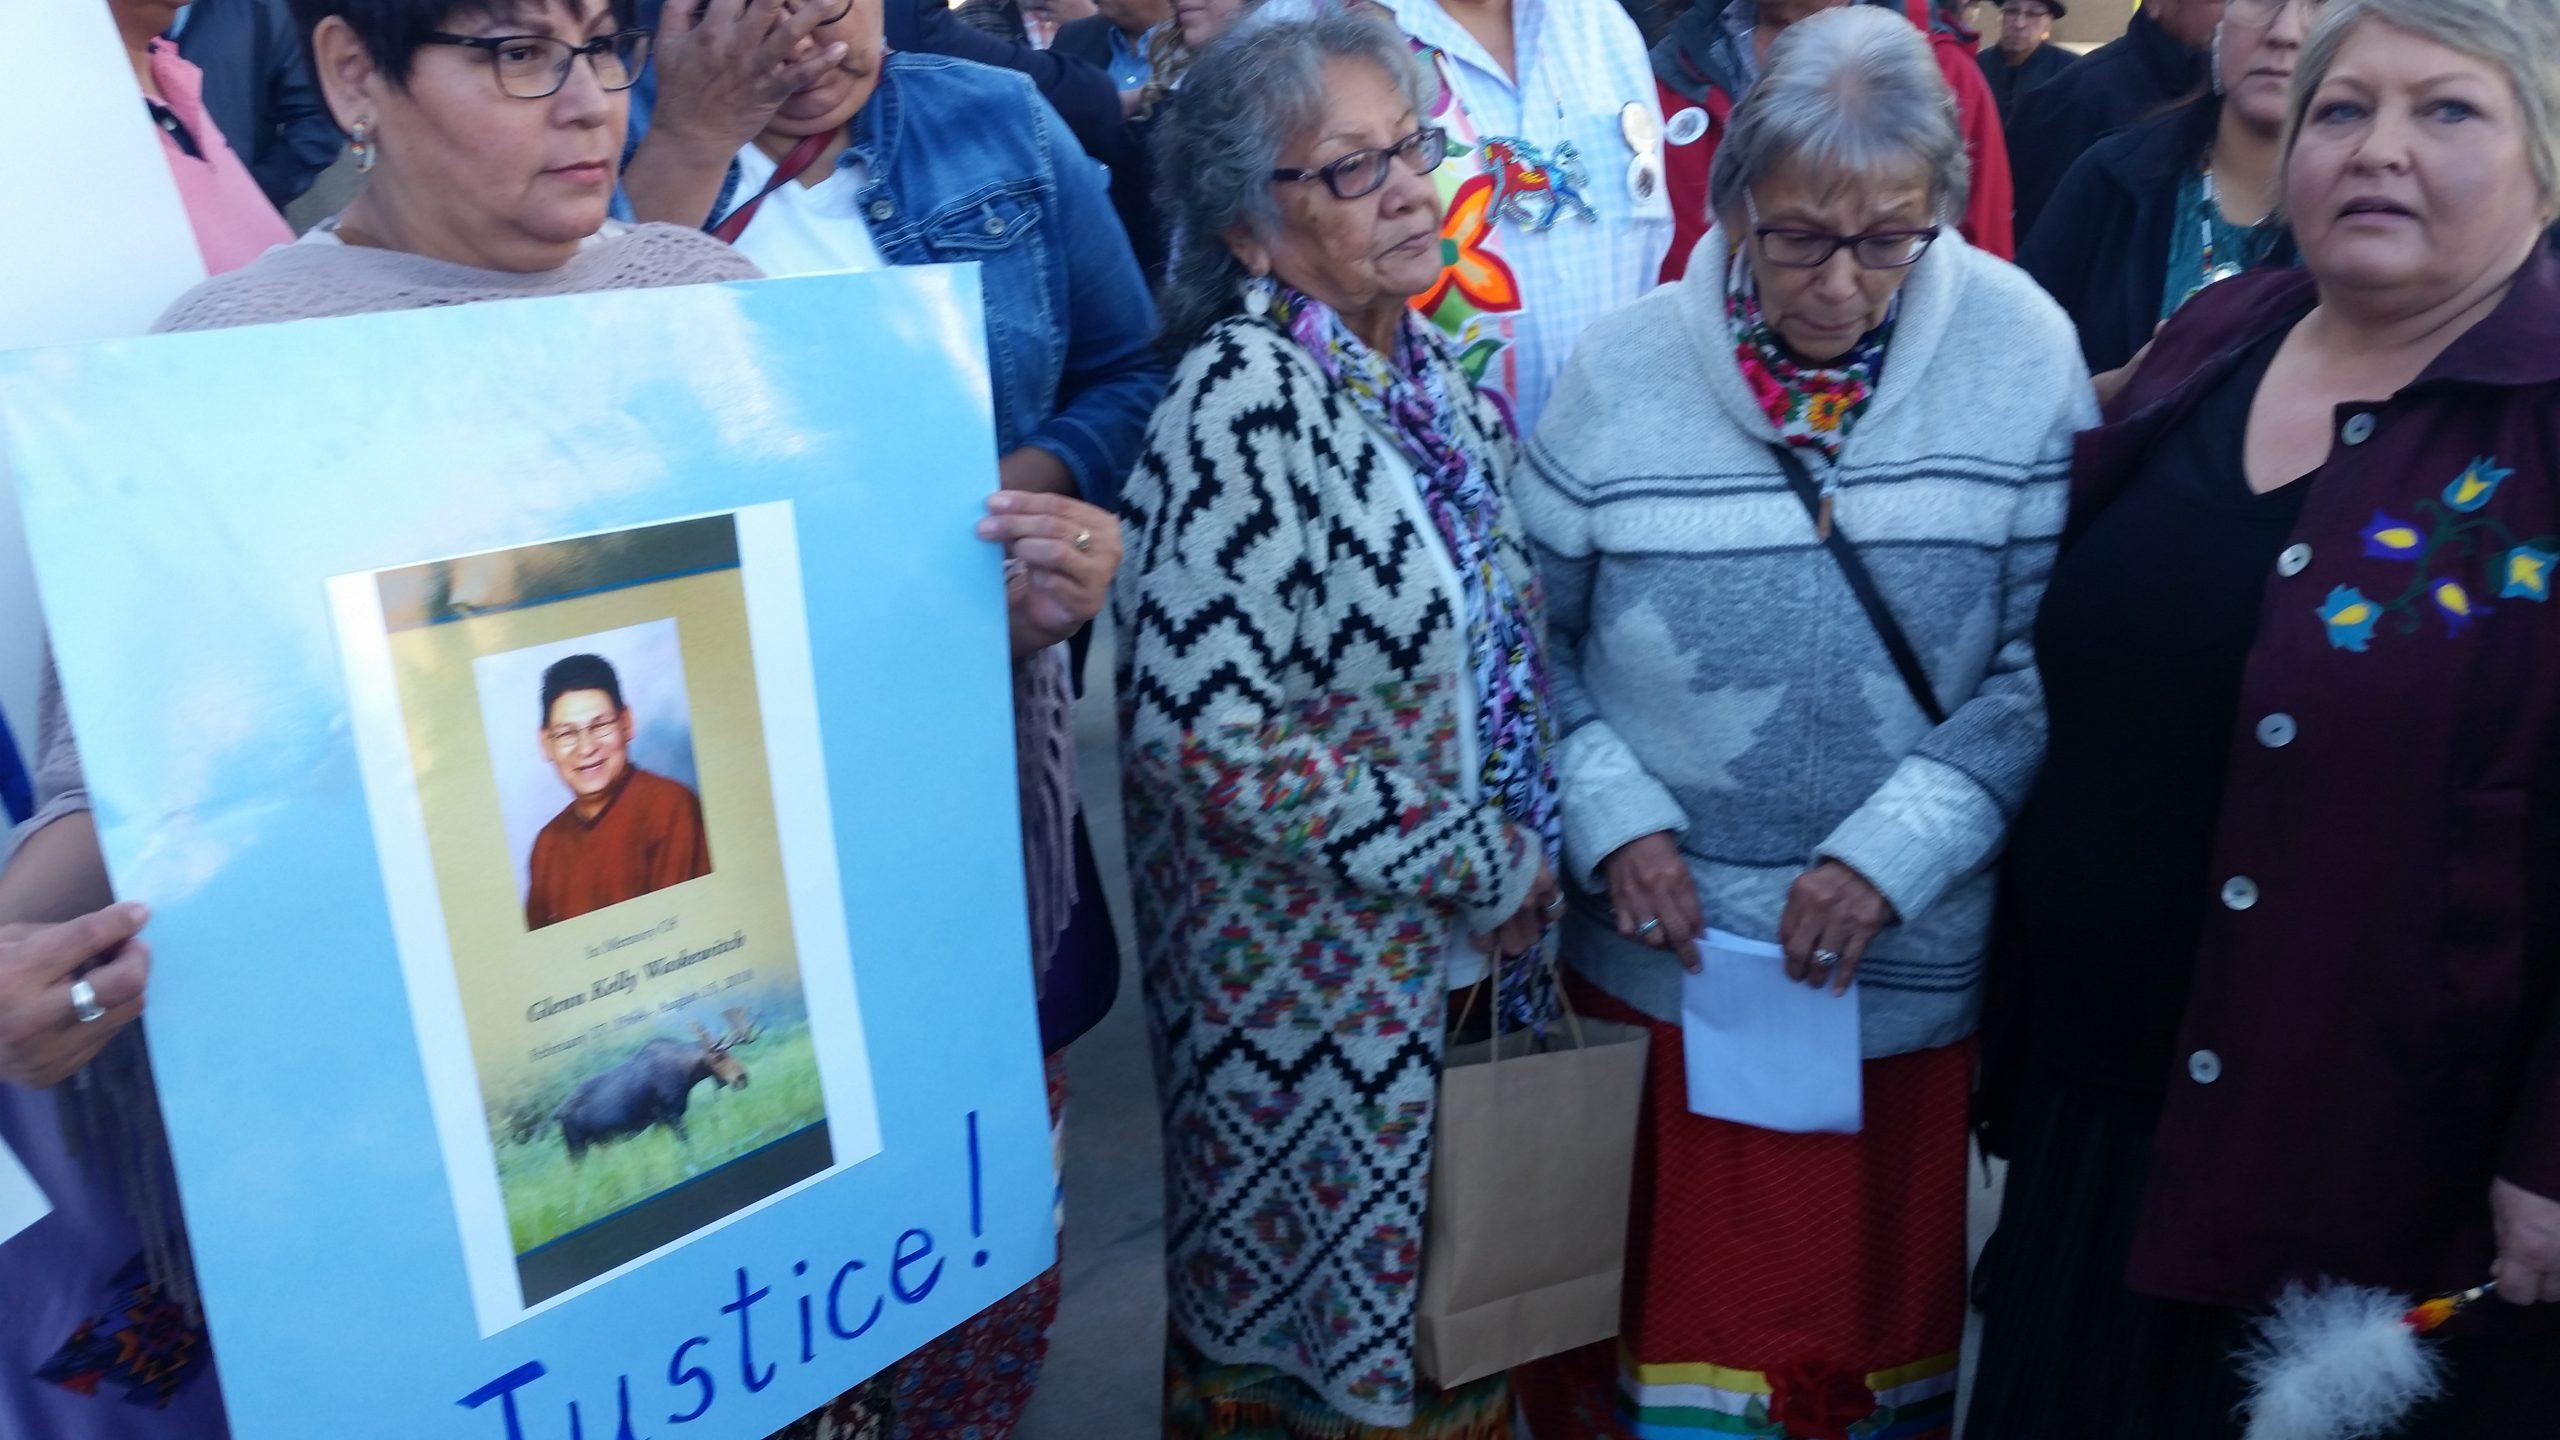 Family of Onion Lake Family man demanding full probe into his death